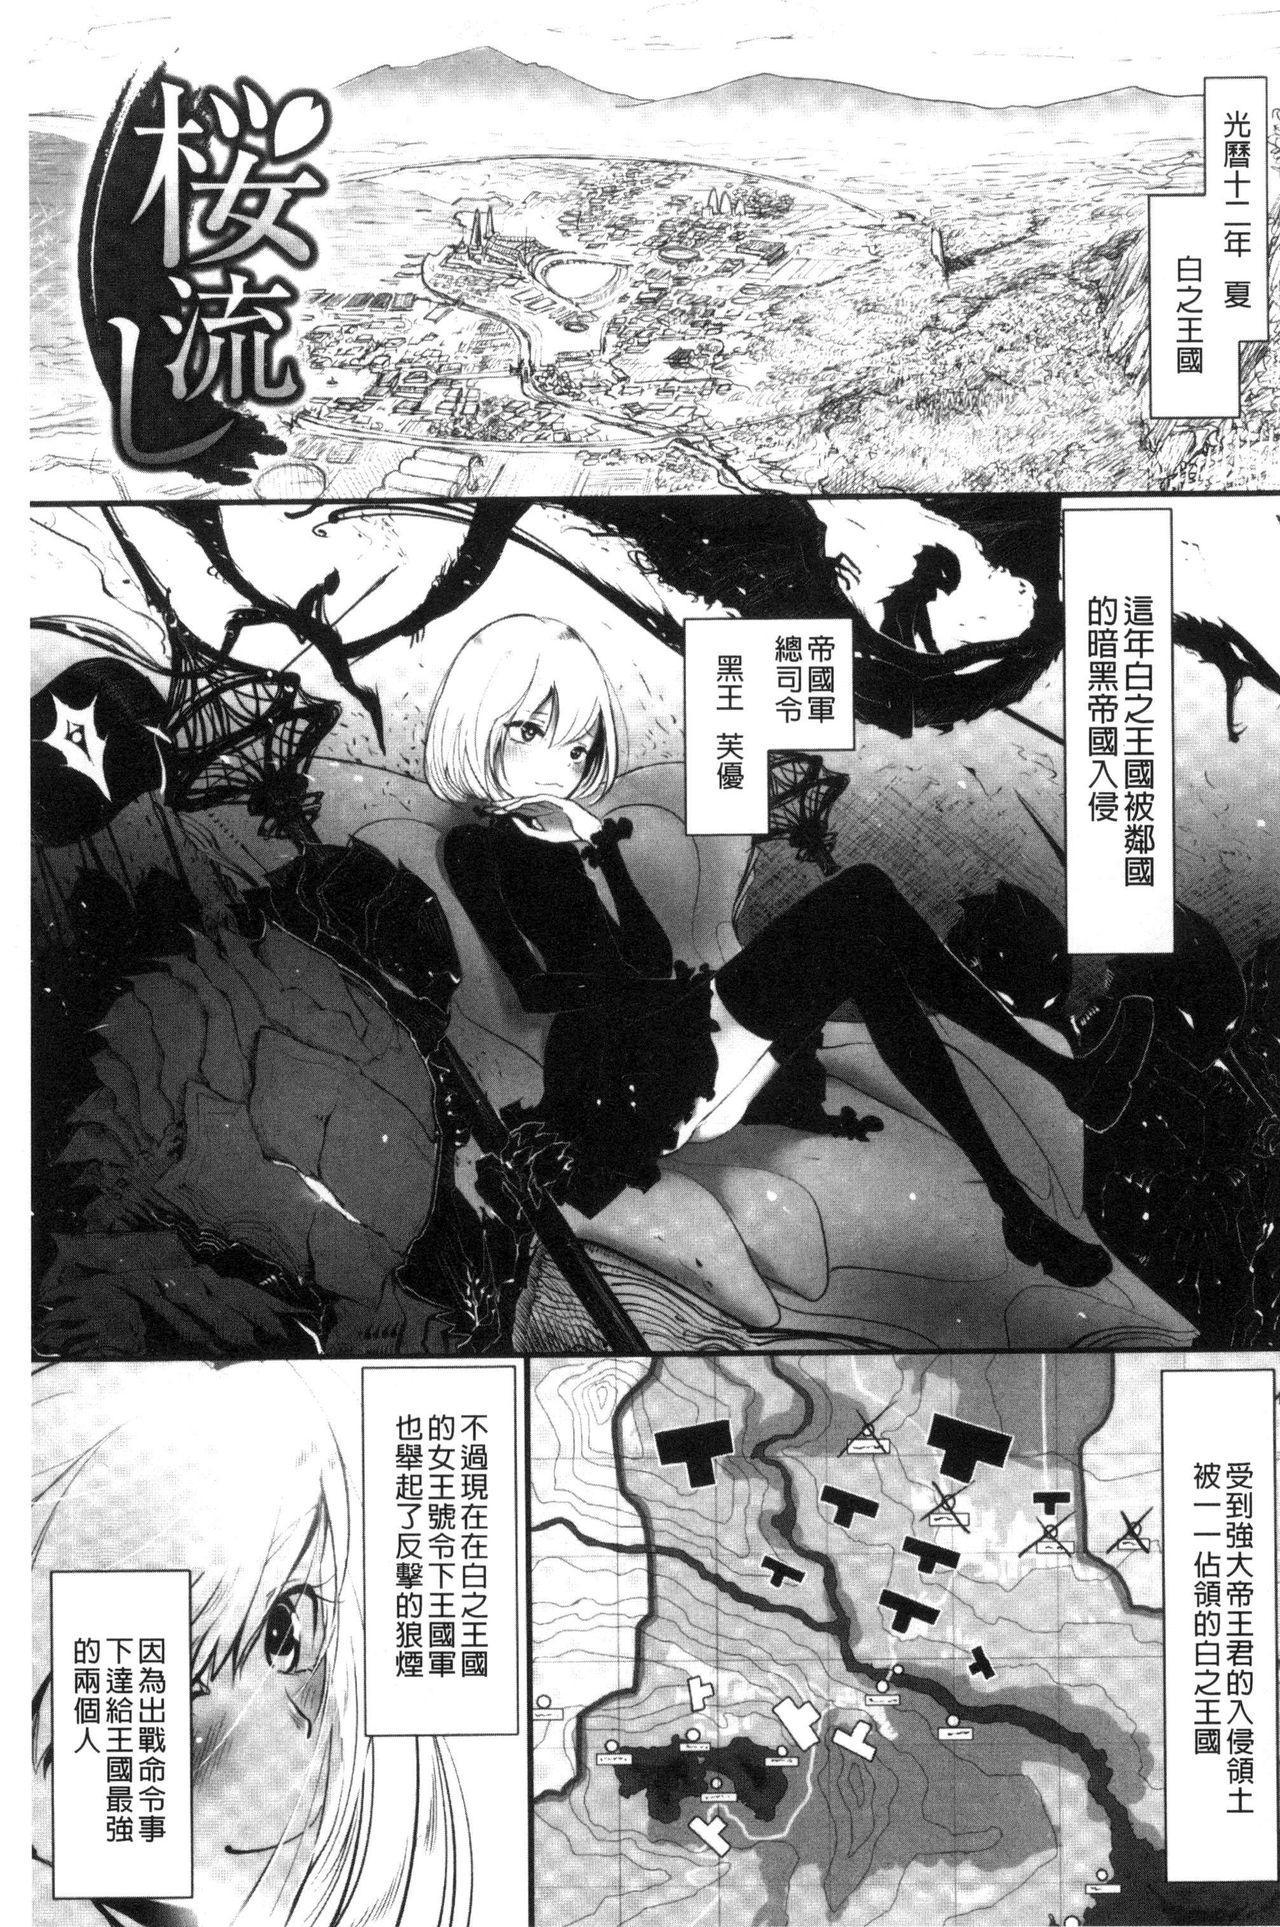 [Dhibi] Sono Yubisaki de Korogashite - Please Caress it at the Finger-tip. [Chinese] 88